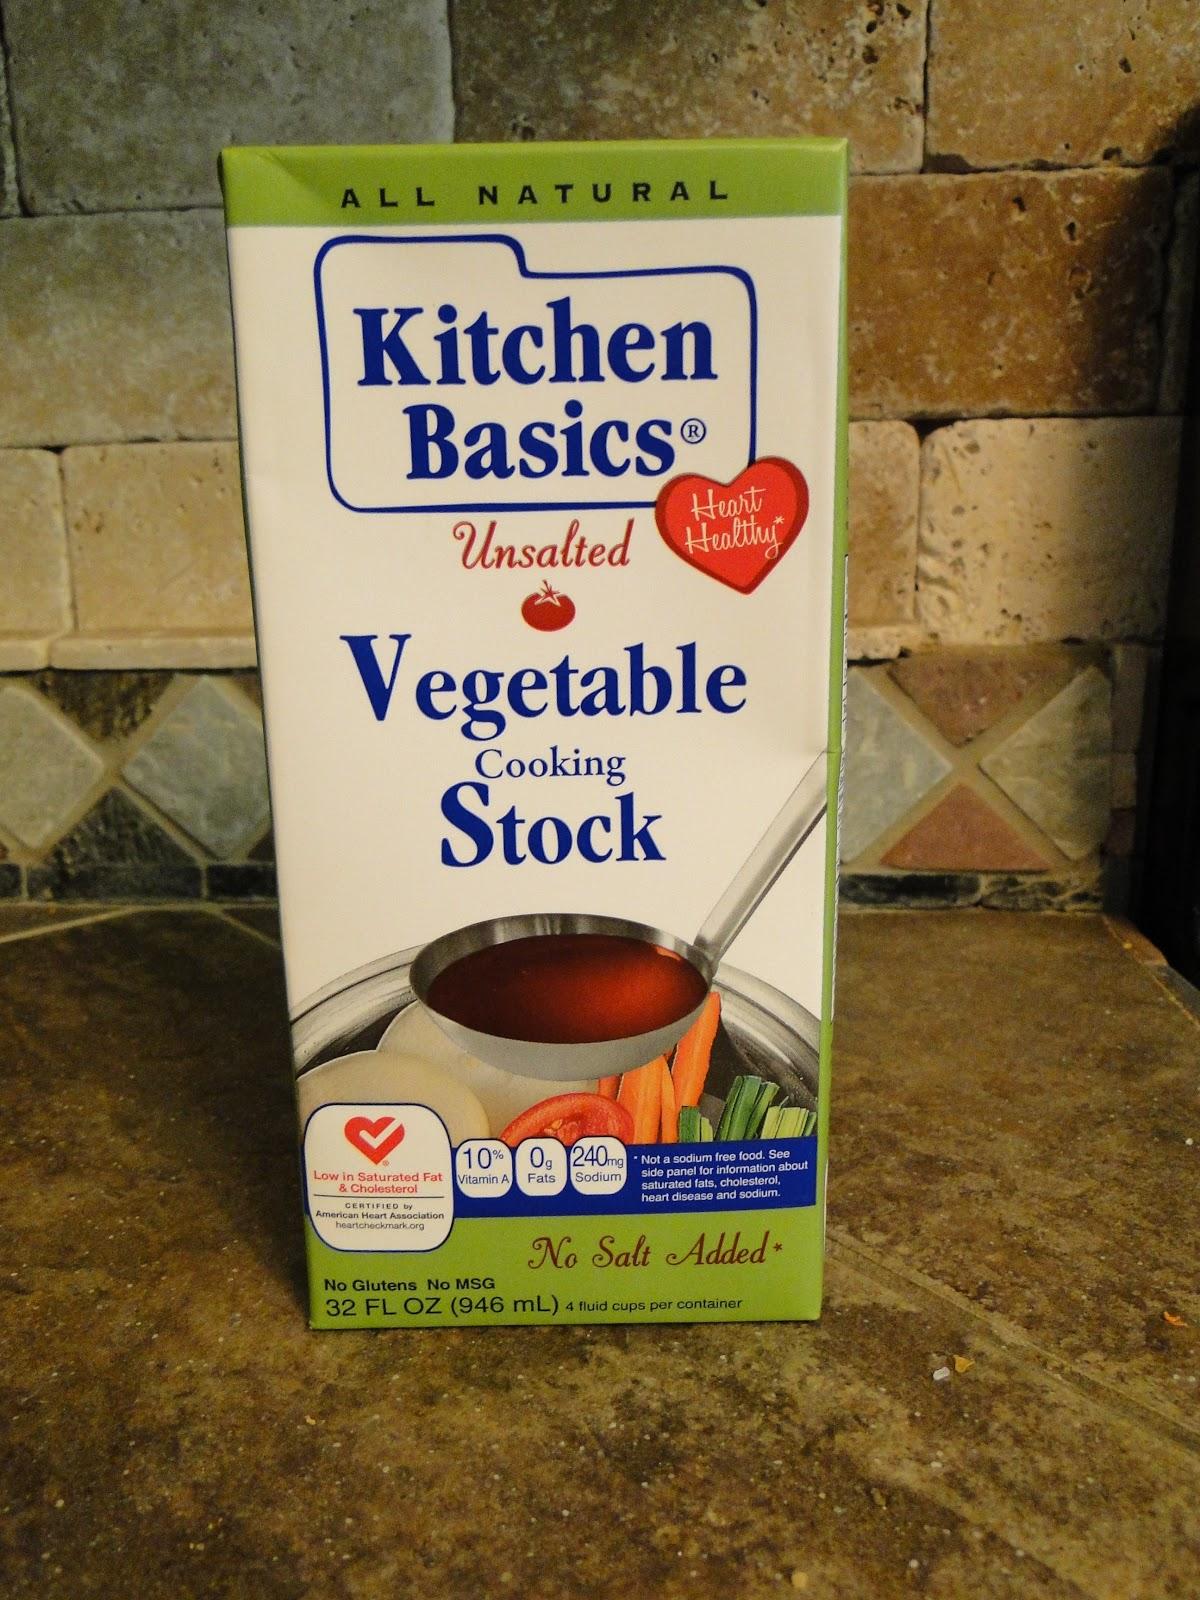 The store brand: Kitchen Basics - Natural Vegetable (no salt added):